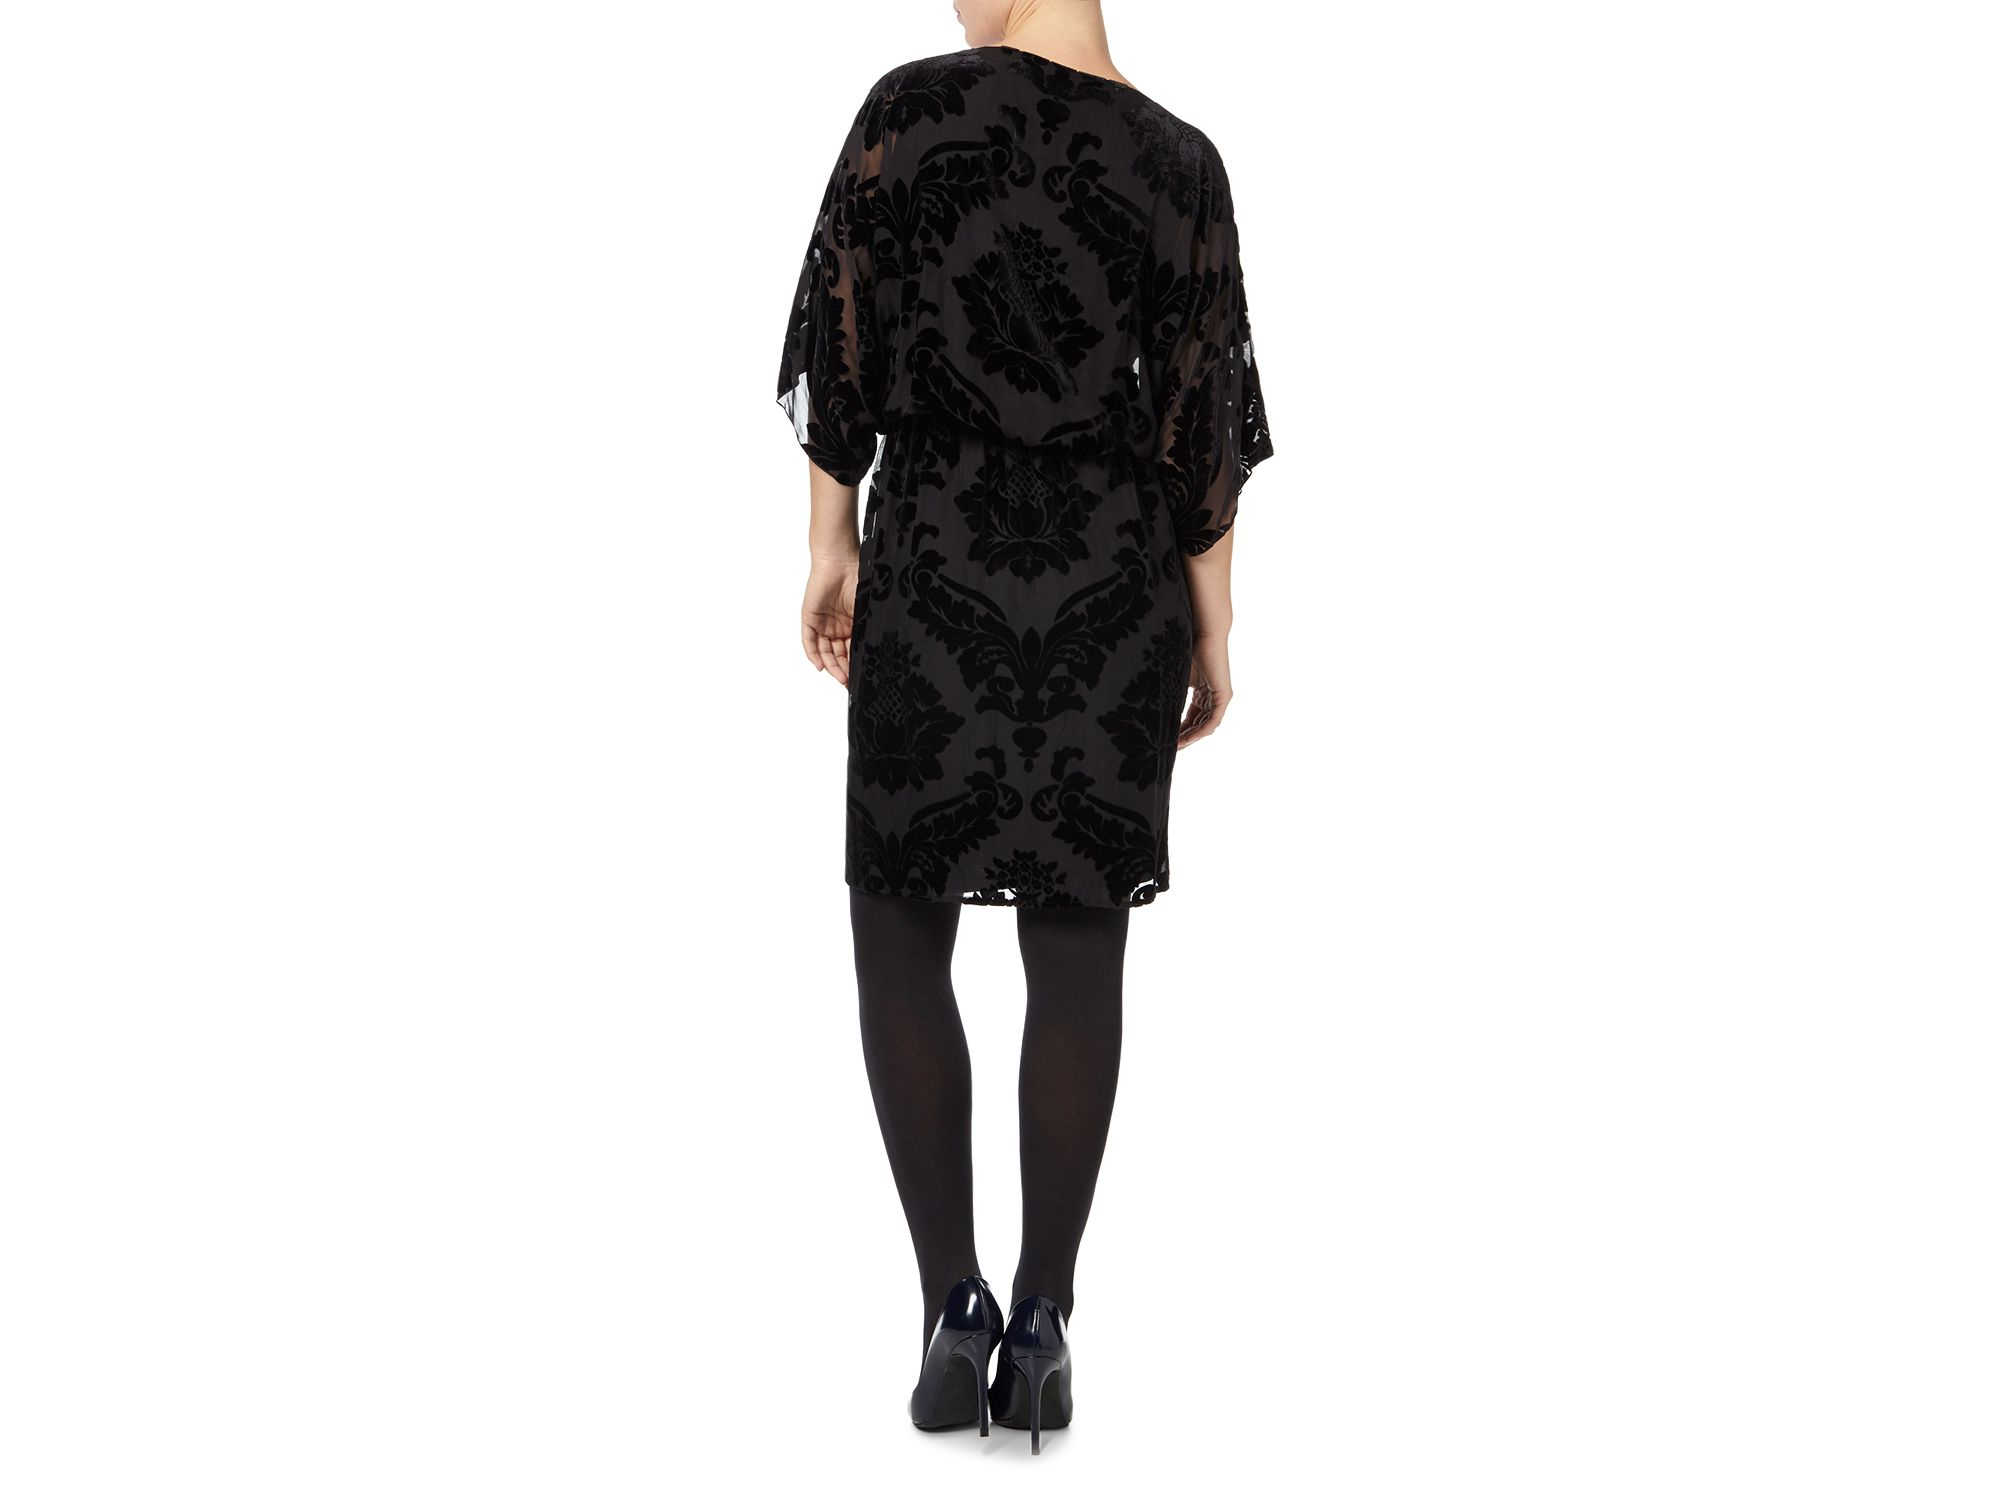 phase eight didi devore dress in black